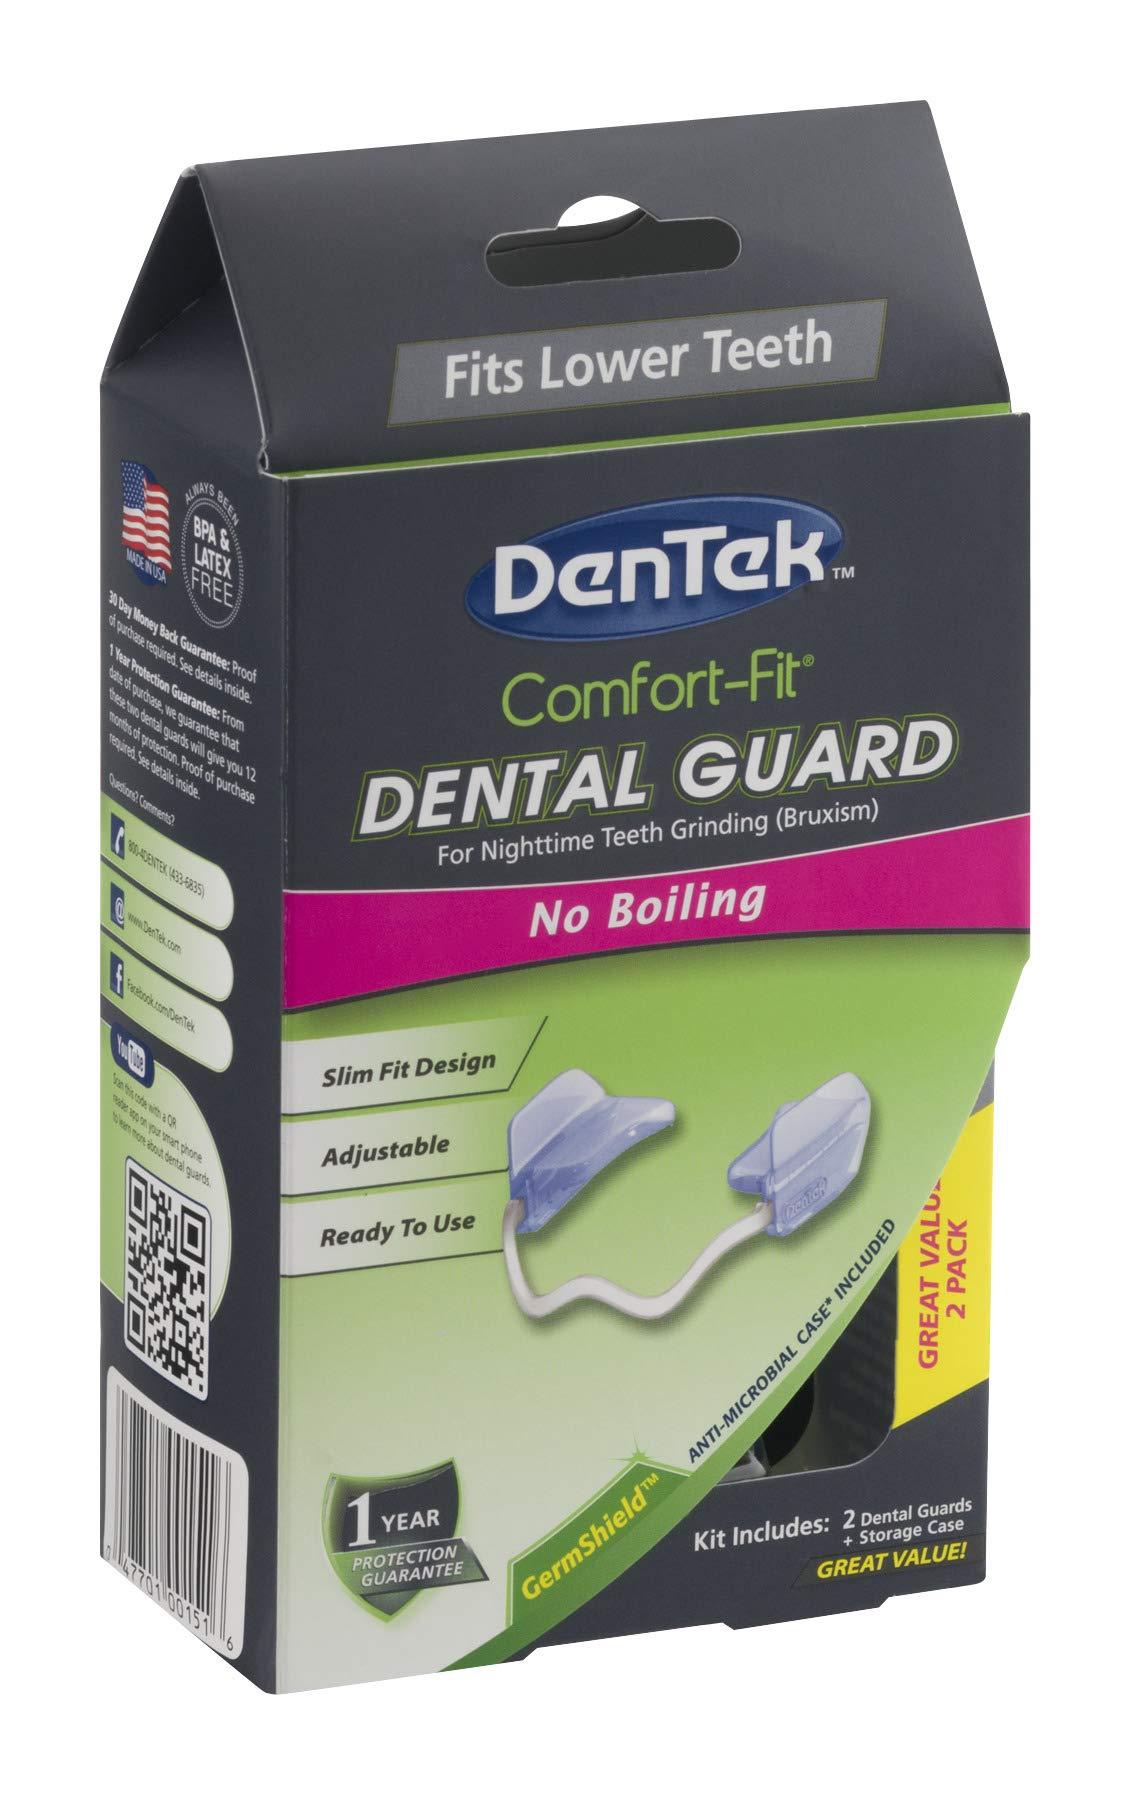 DenTek Comfort-Fit Dental Guard Kit | For Nighttime Teeth Grinding | 2 Pack